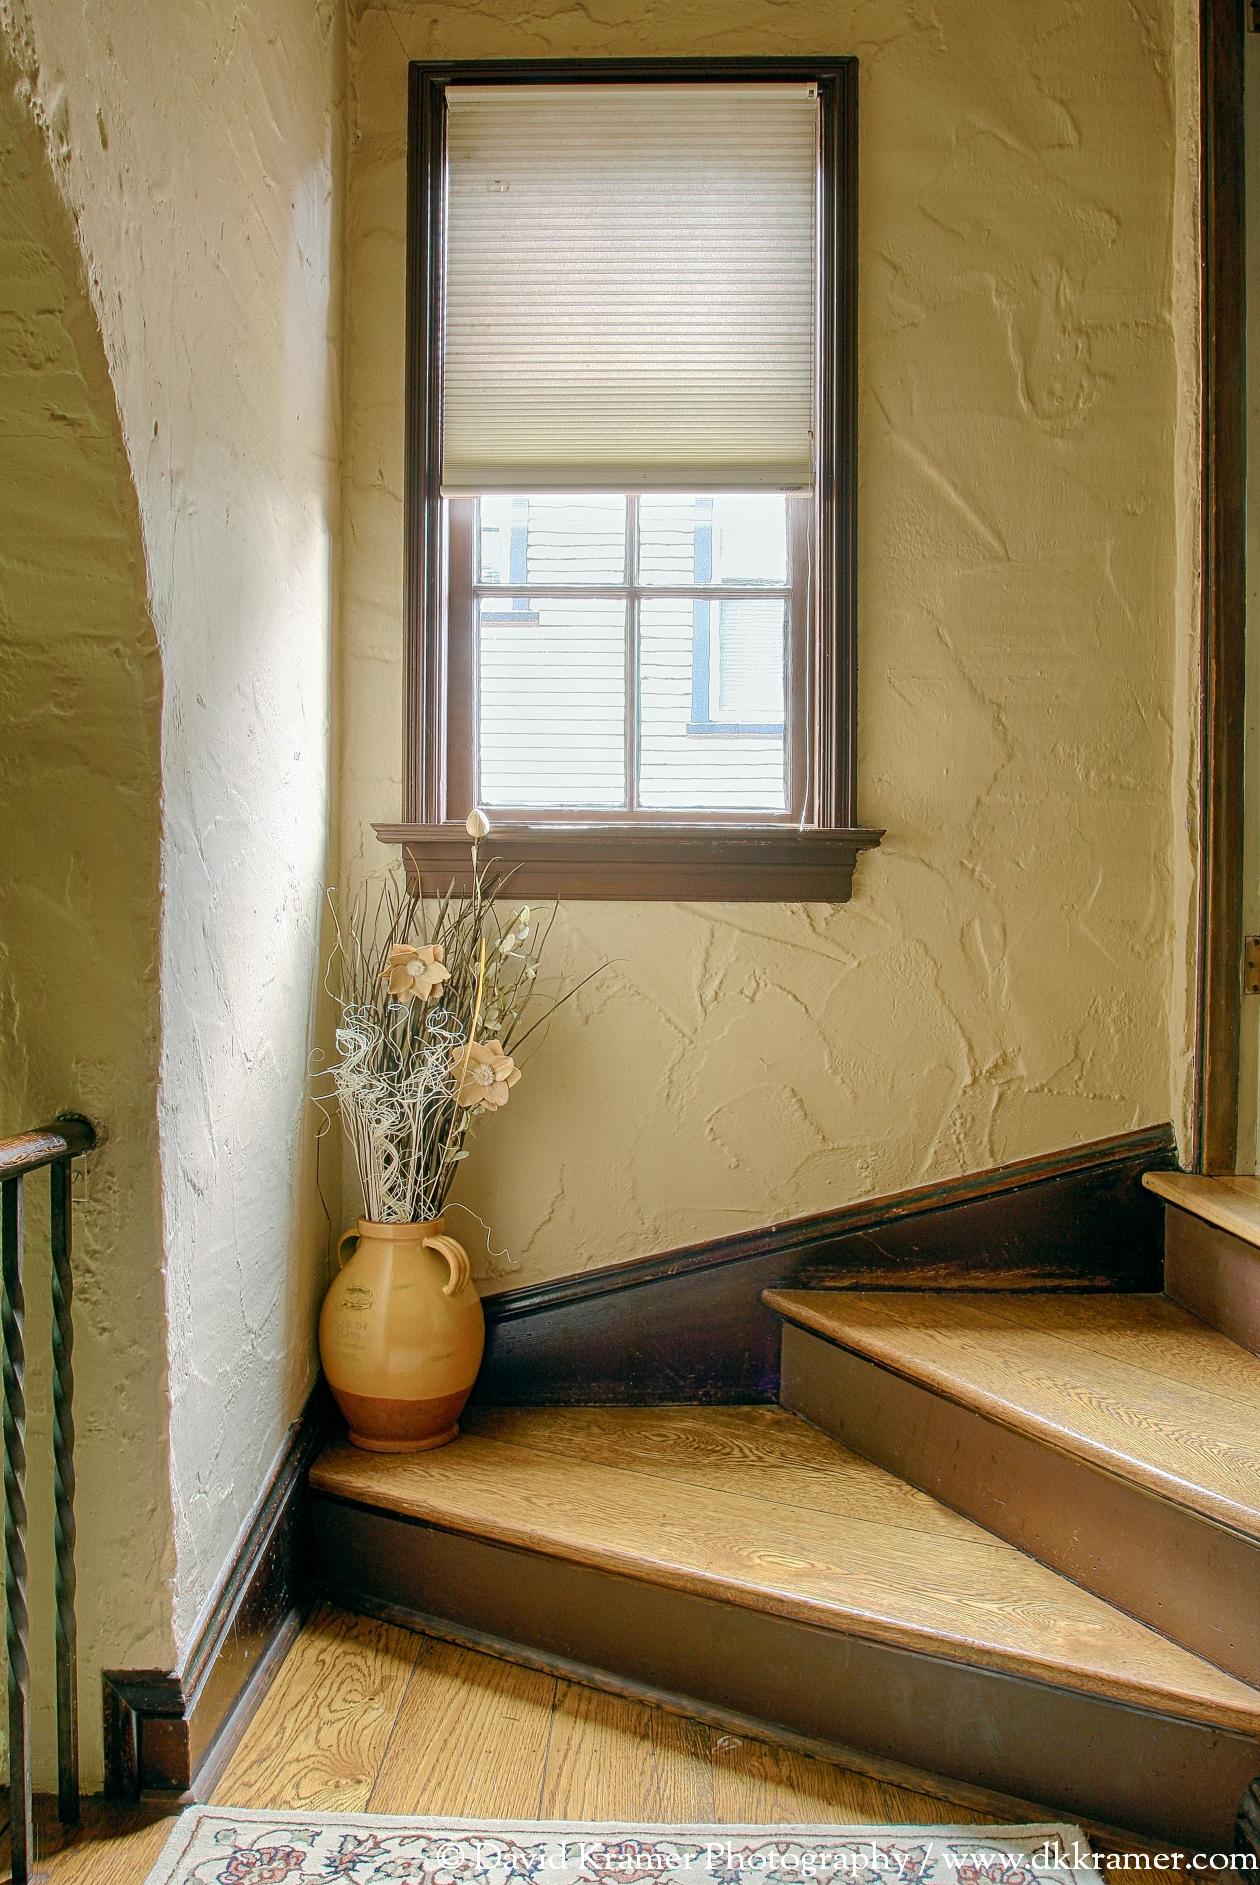 15 LNA-BrickHouse-Stairs-DKPhoto.jpg